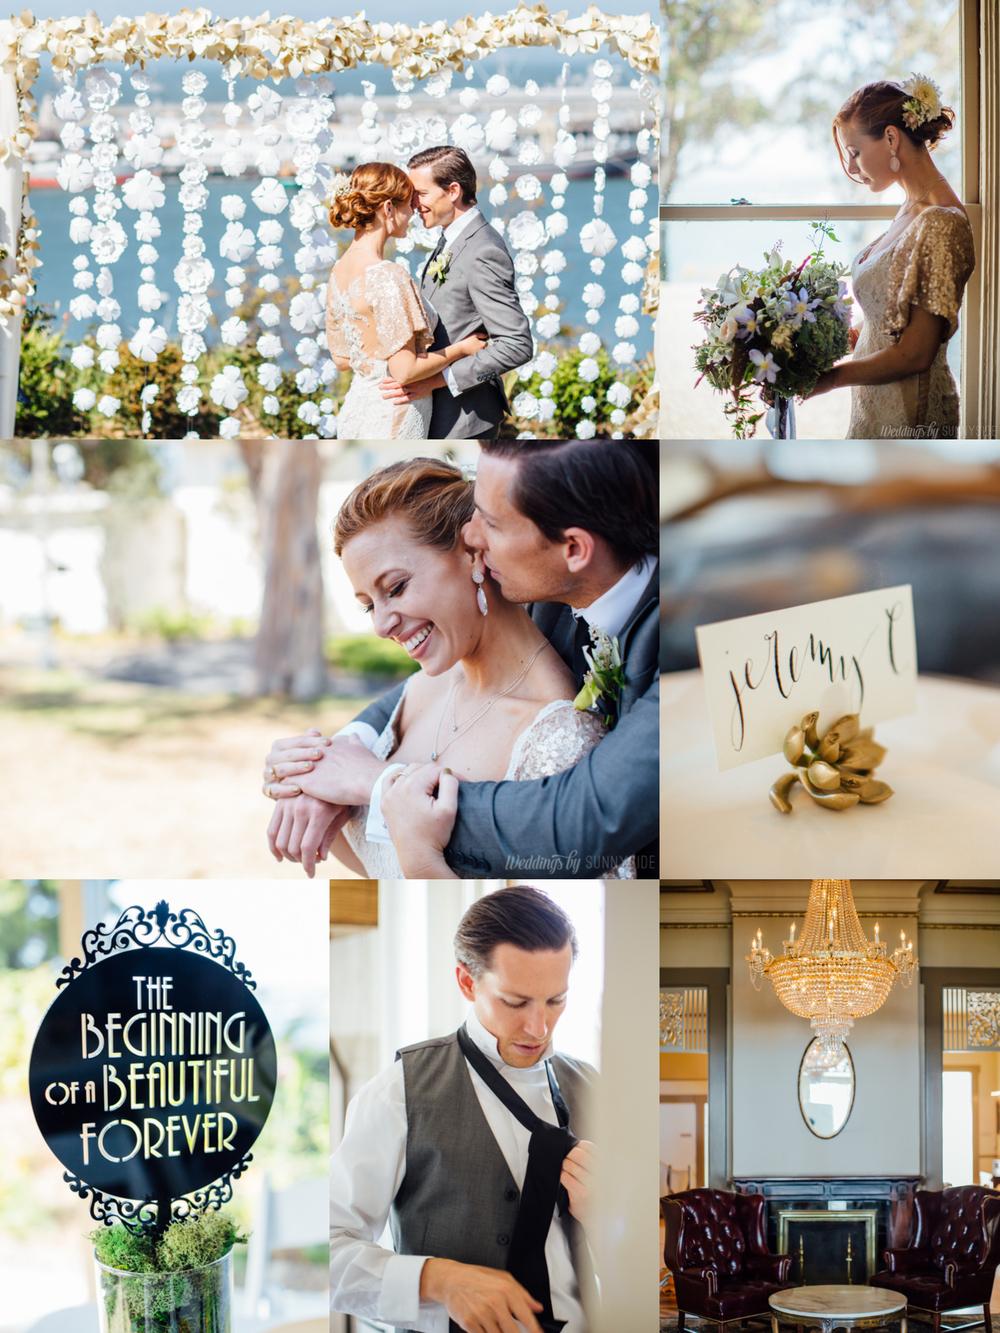 Photography: Weddings by Sunnyside